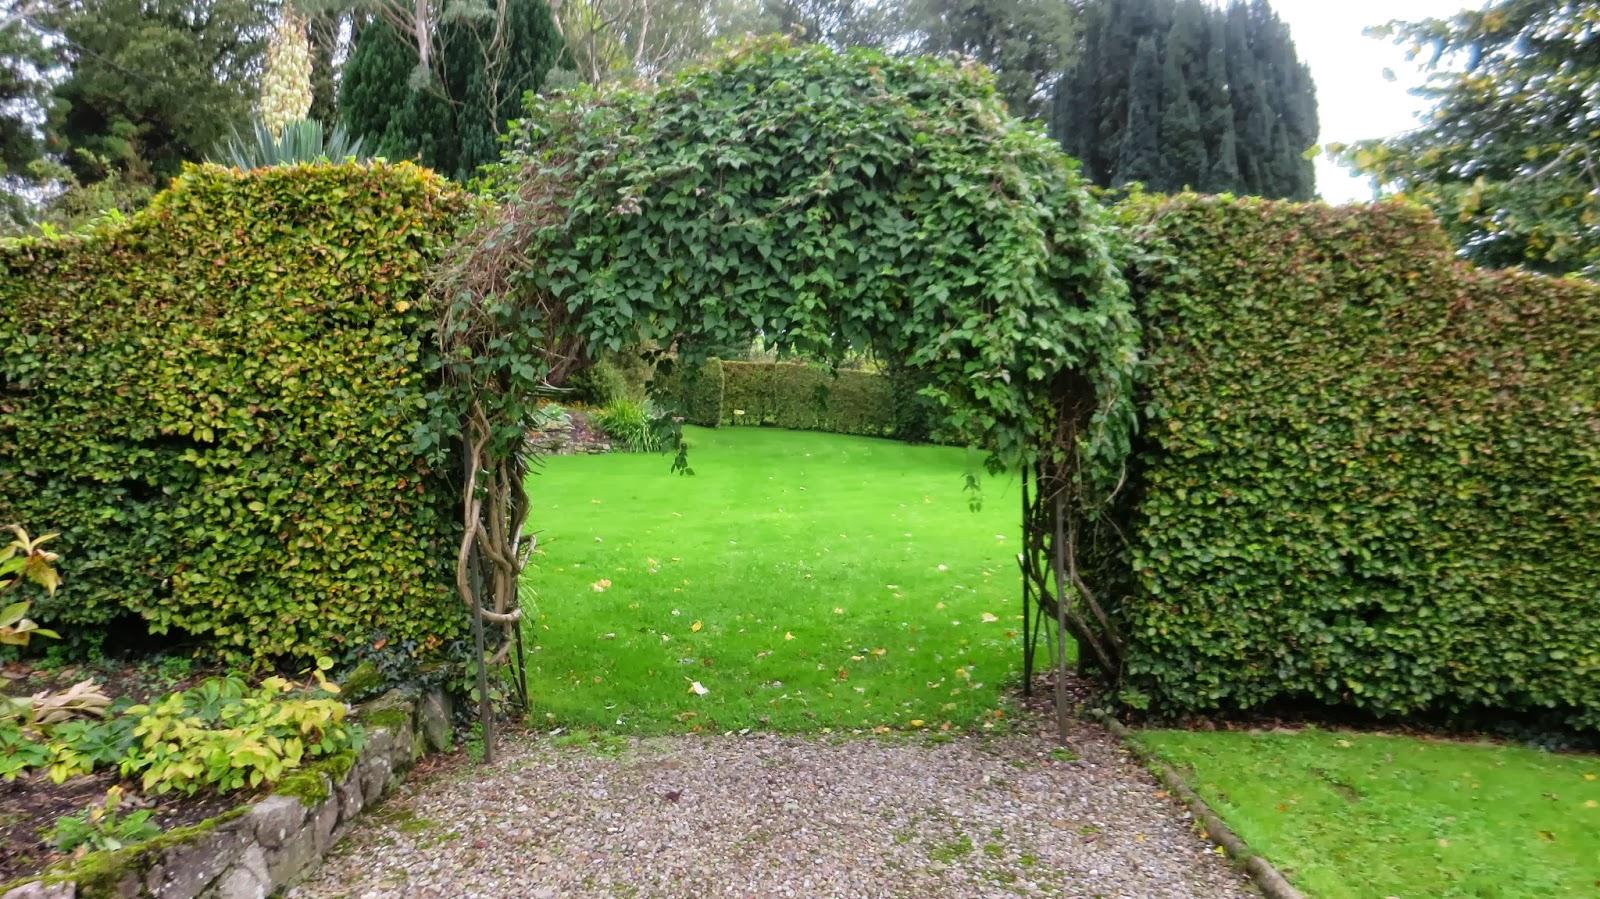 hortibus voyage de reperage en irlande jardins prives. Black Bedroom Furniture Sets. Home Design Ideas